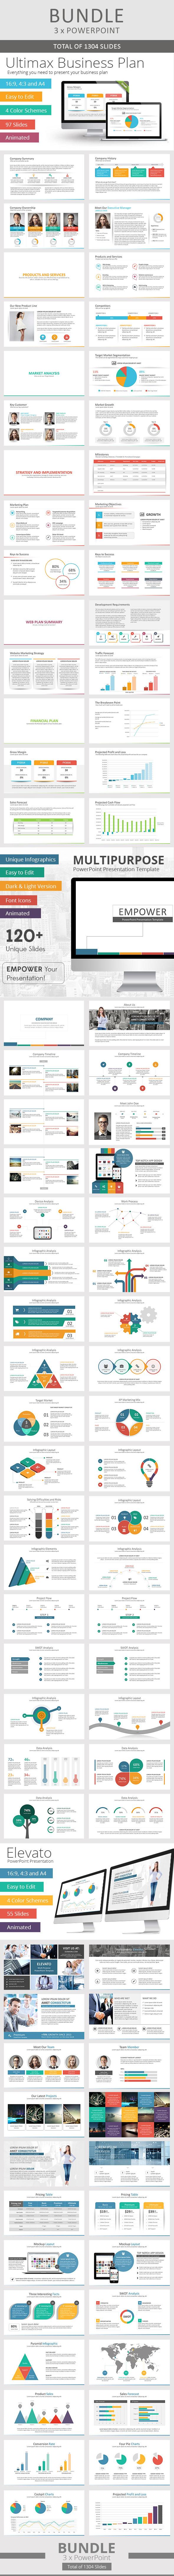 GraphicRiver 3 x Multi-Purpose PowerPoint Bundle 10632111